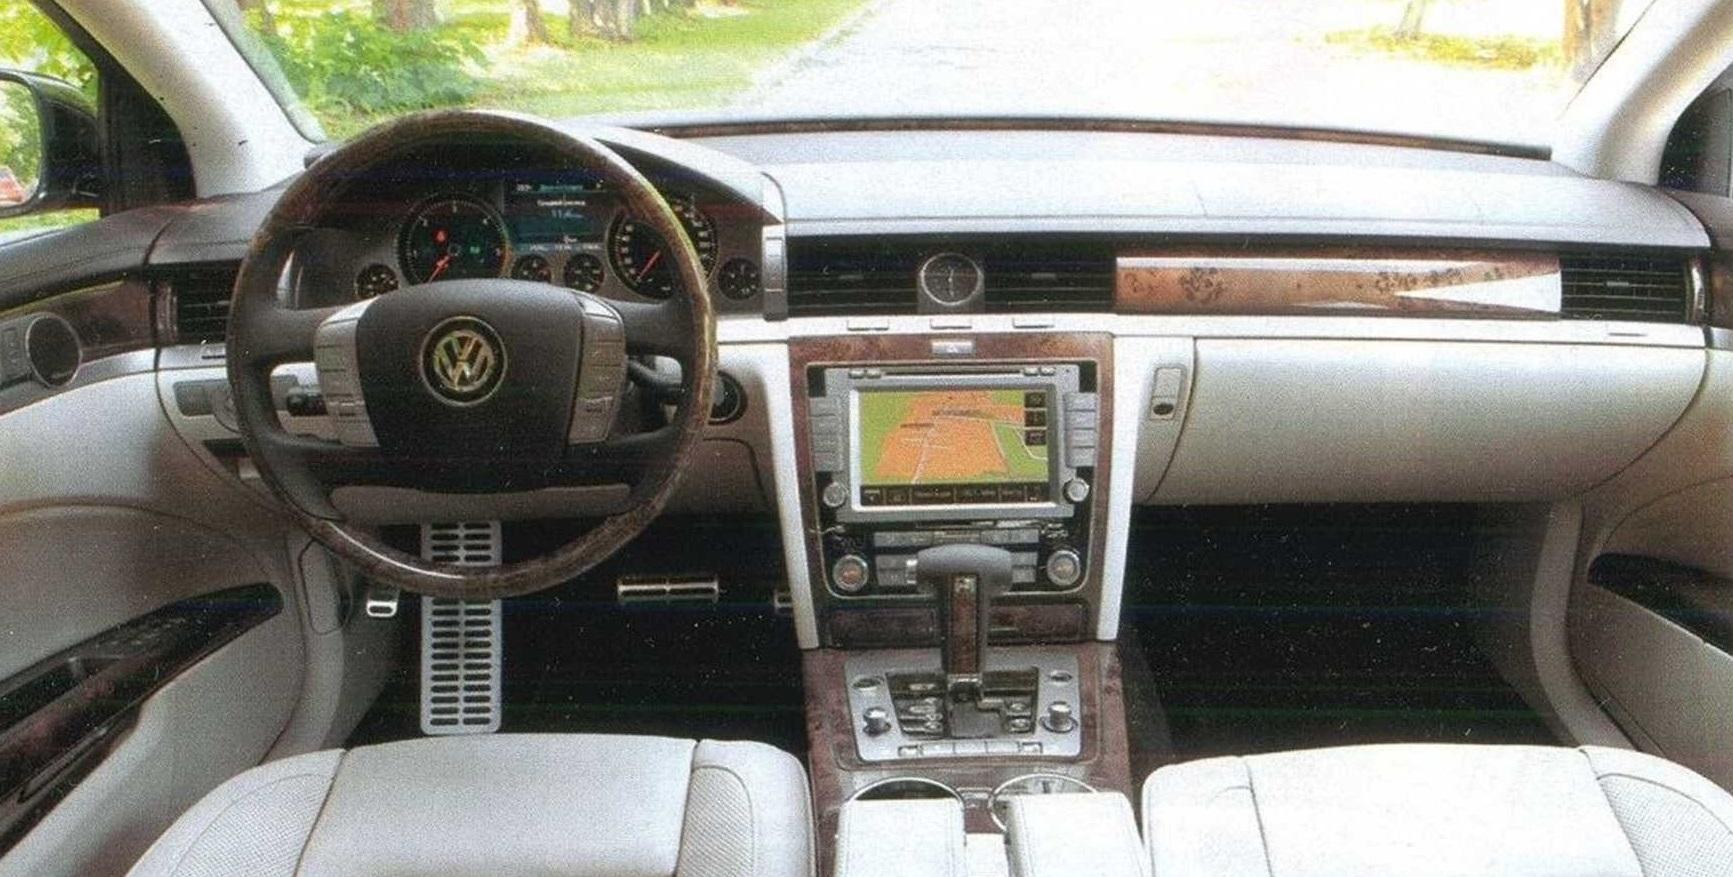 Седаны Тест VW Phaeton, Jaguar XJ, Hyundai Equus и Kia Quoris